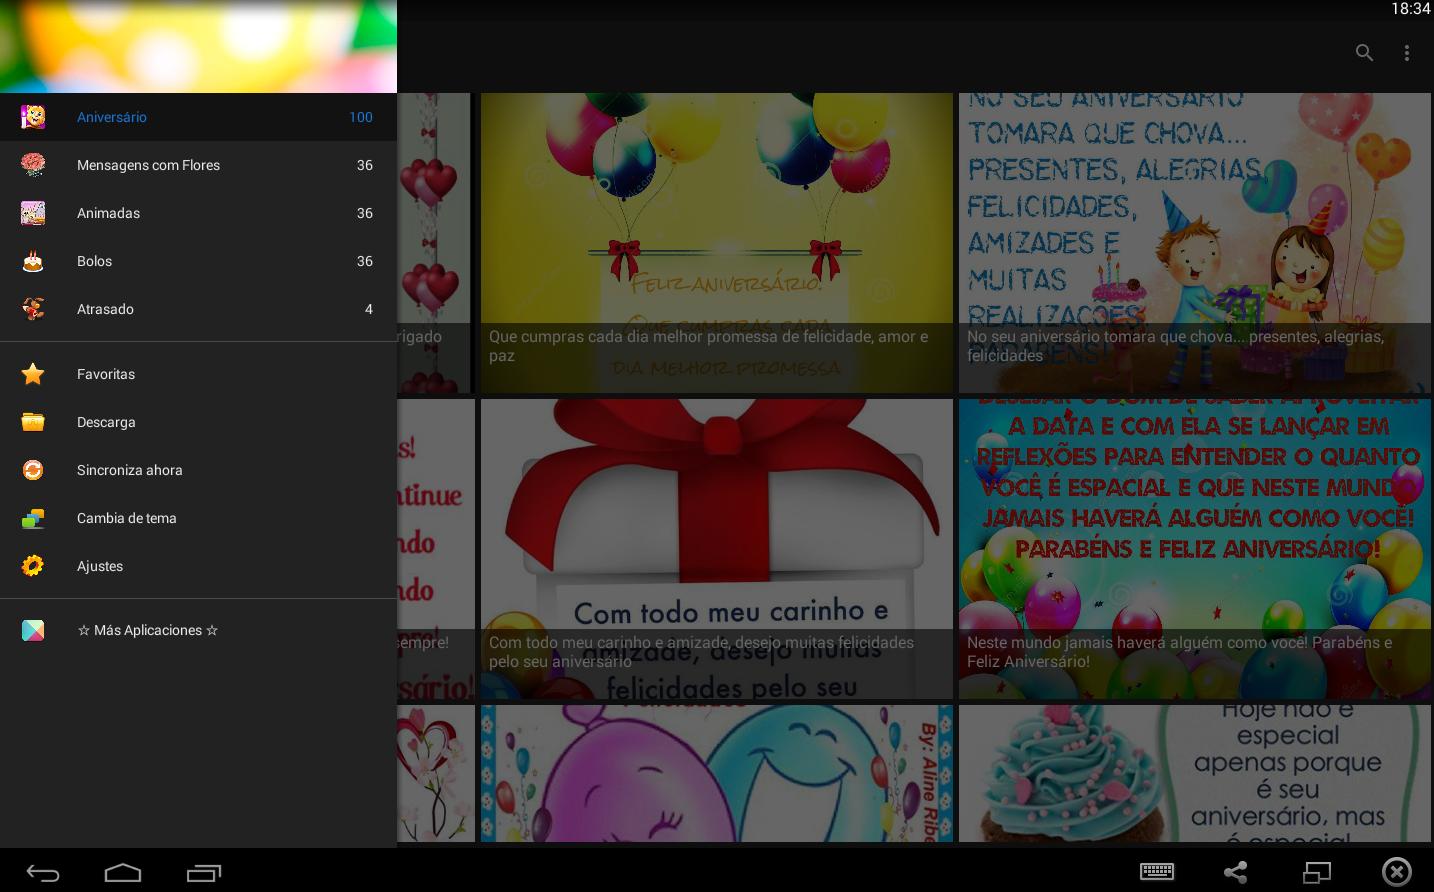 Feliz Aniversario Imagenes: Android Apps On Google Play